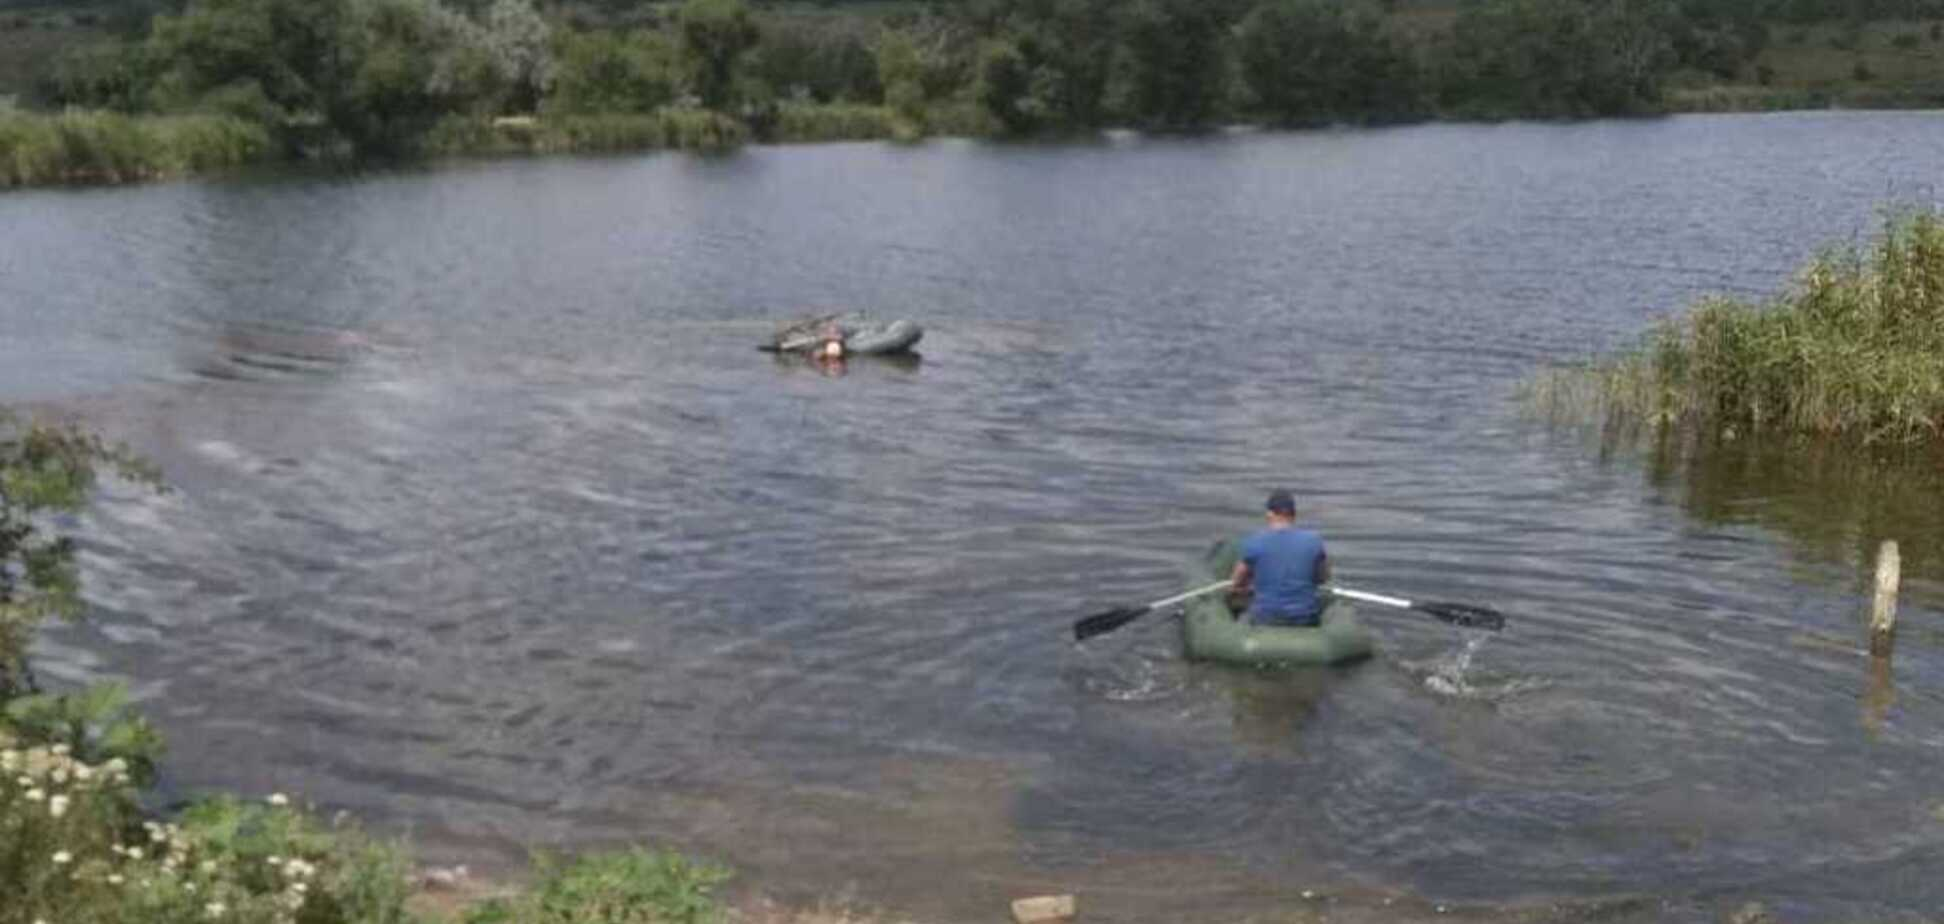 Под Кривым Рогом спасатели выловили лодку с трупом мужчины внутри